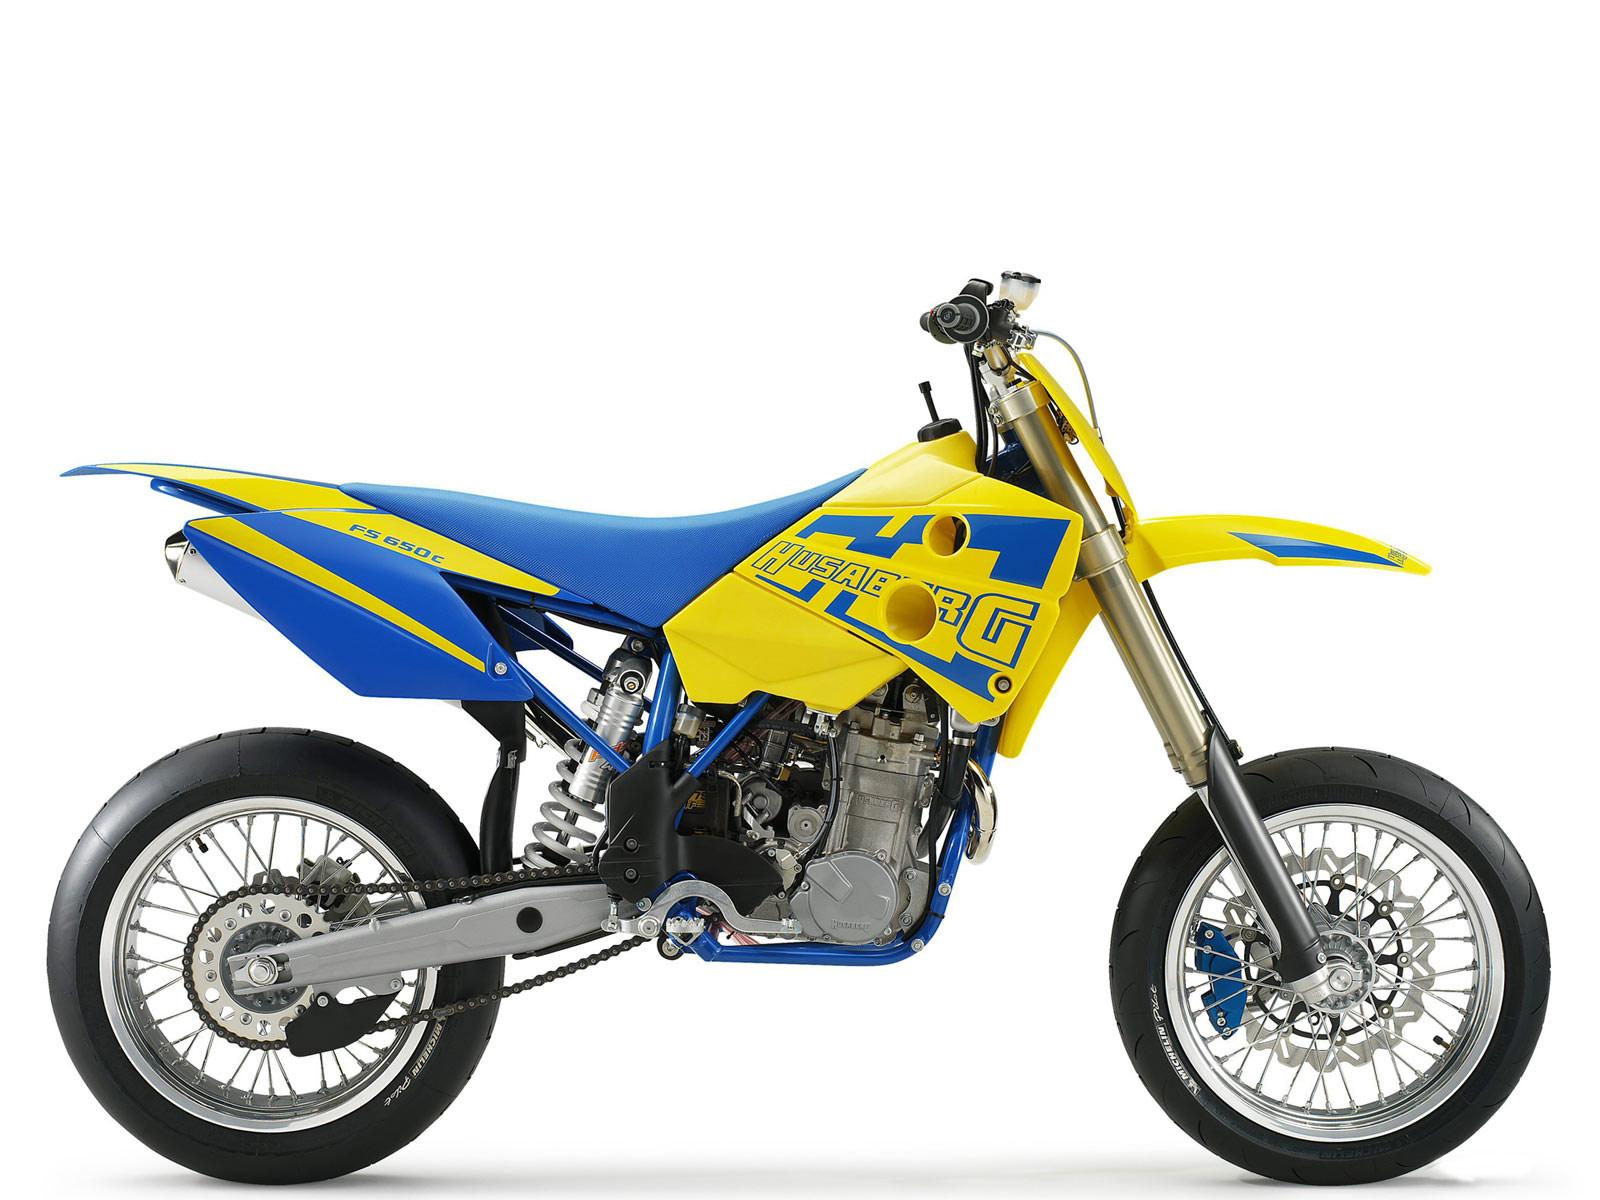 Model: Husaberg FS 650 e. Year: 2005. Category: Super motard